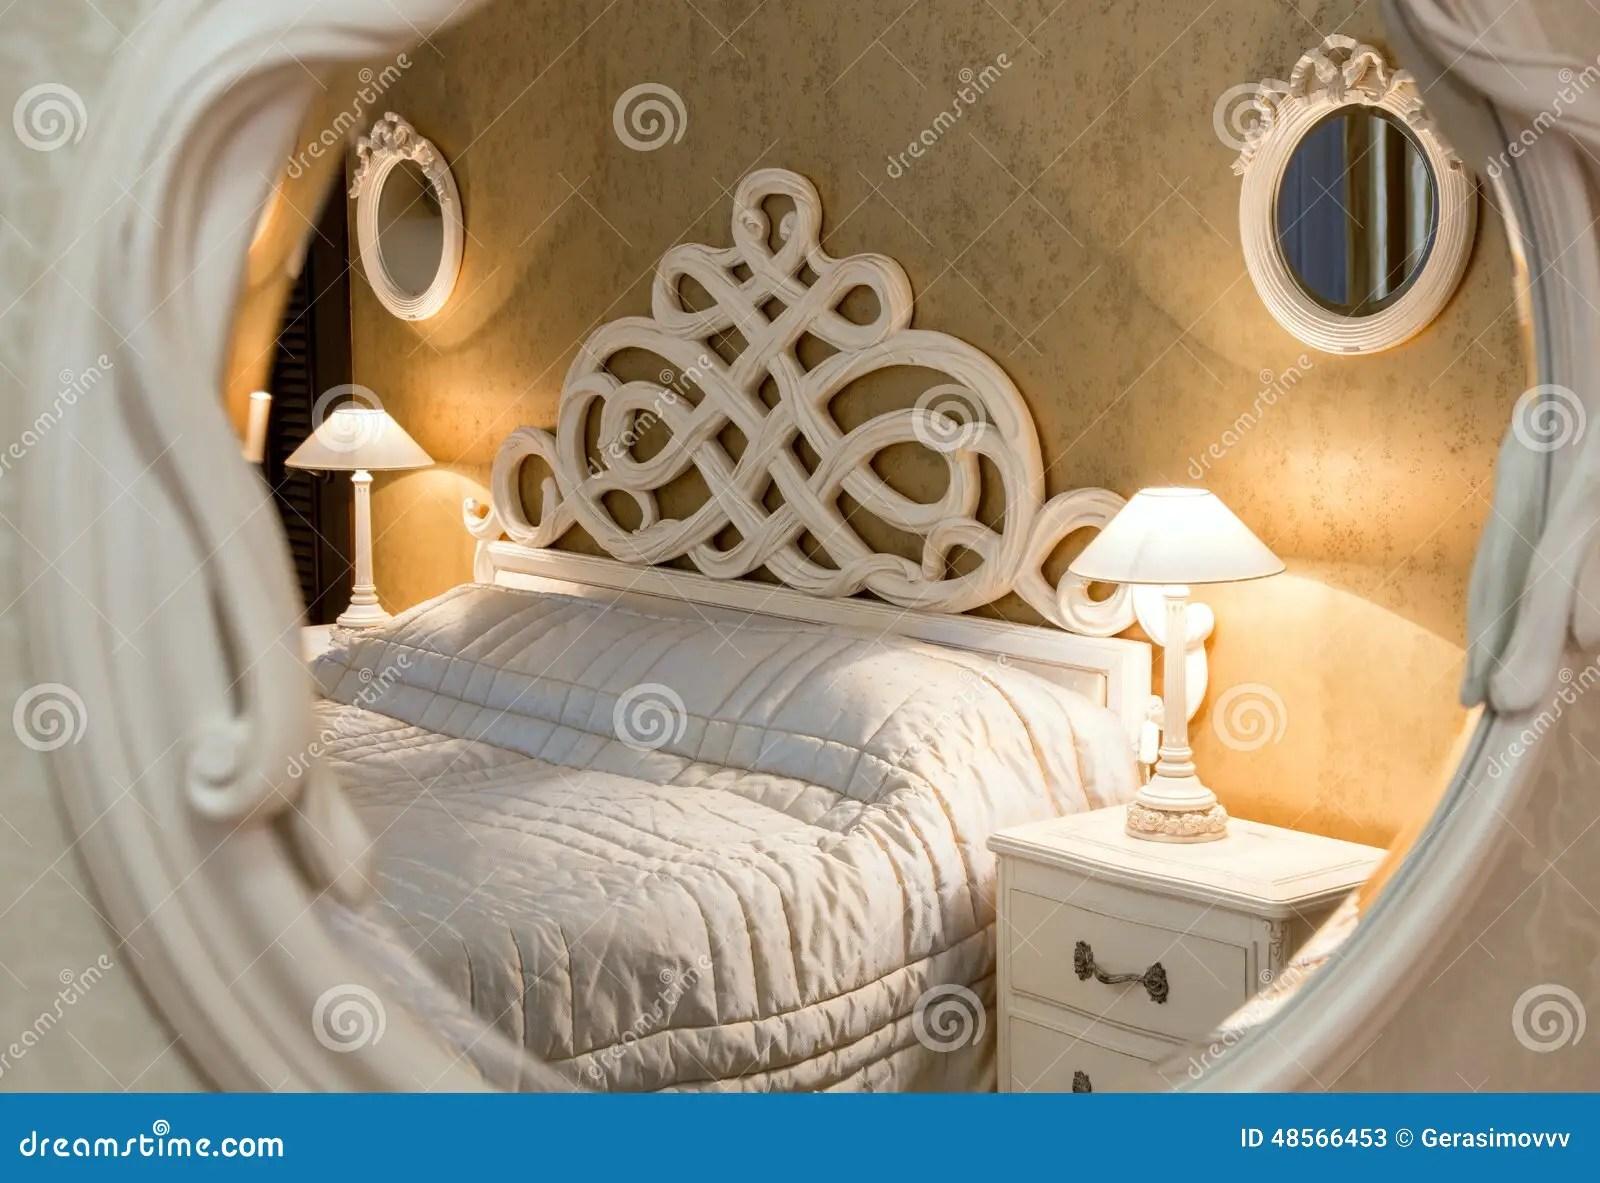 vintage bedroom seen through the mirror stock image image of door carved 48566453